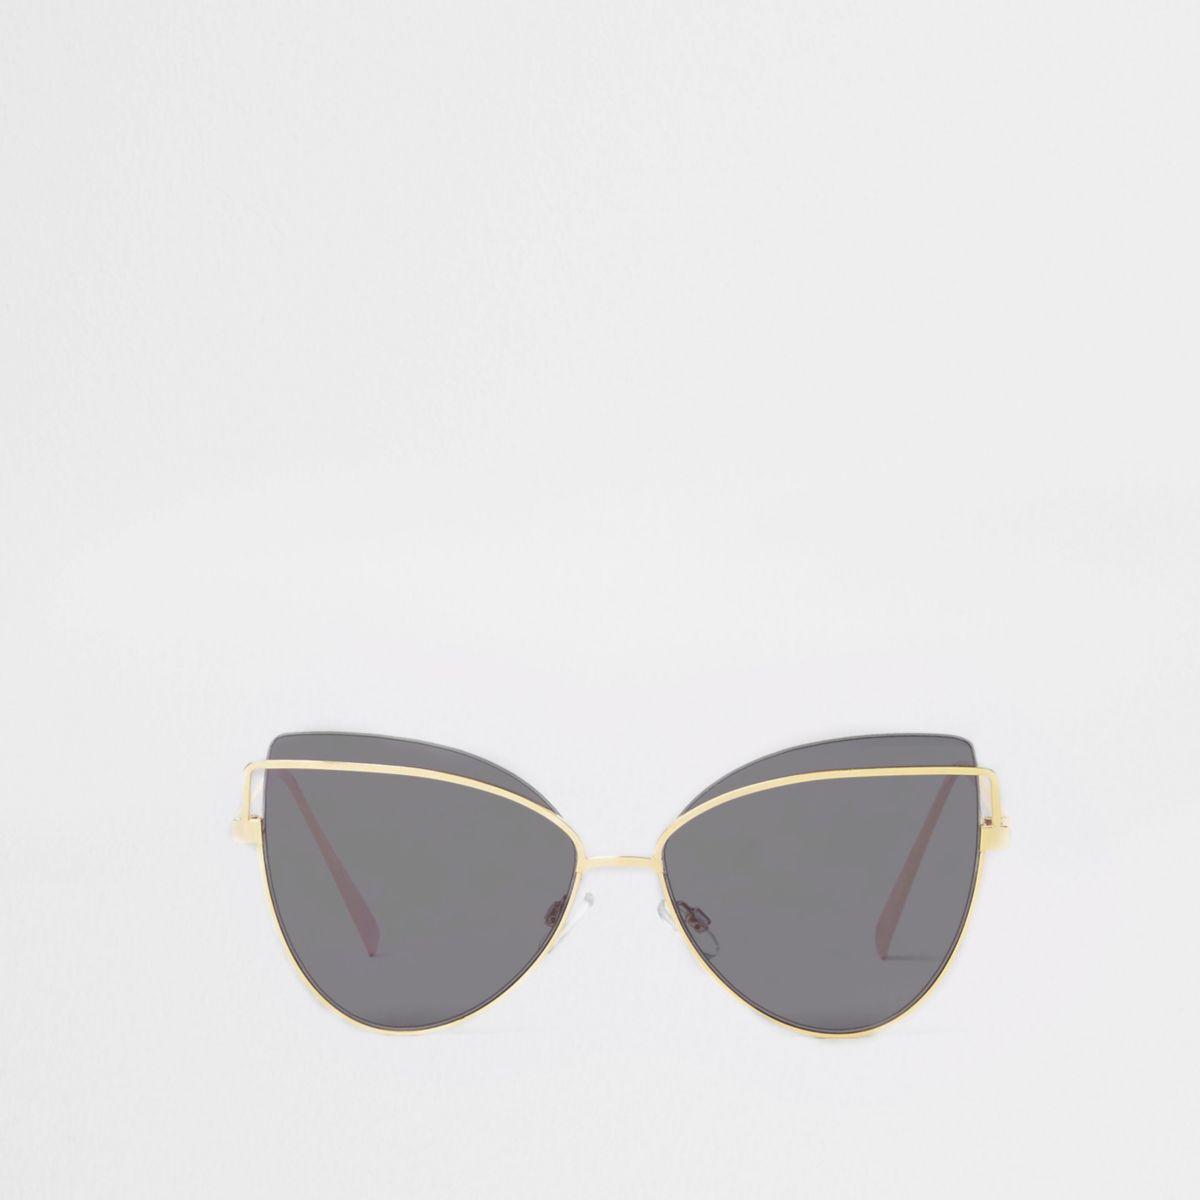 Gold tone black lens cat eye sunglasses